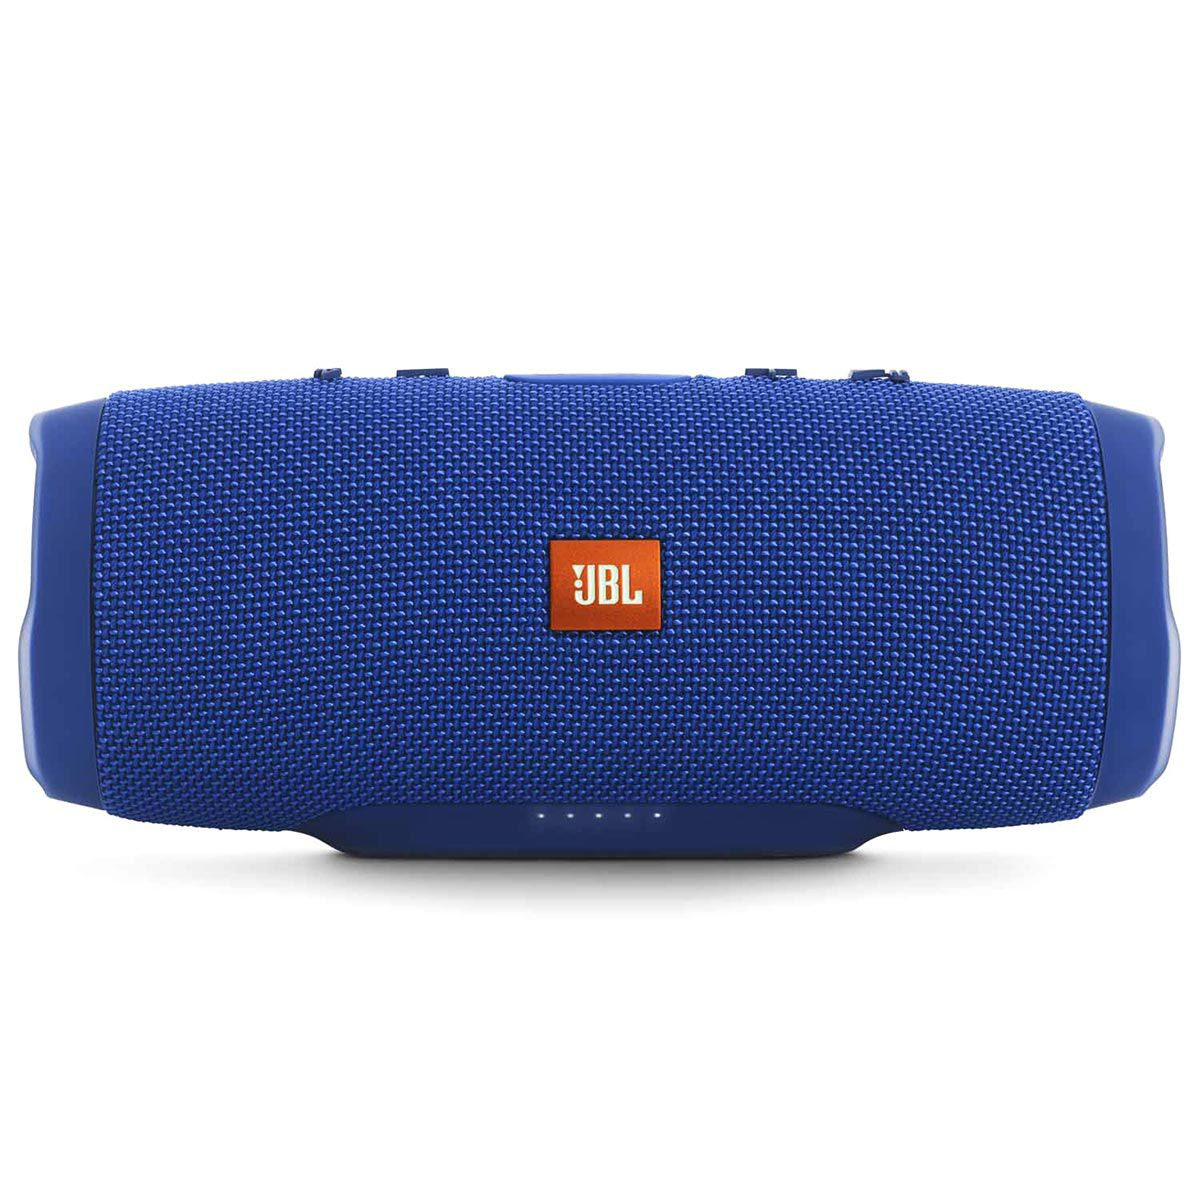 Caixa Som Bluetooth Jbl Charge 3 Portátil Prova D'água - Azul